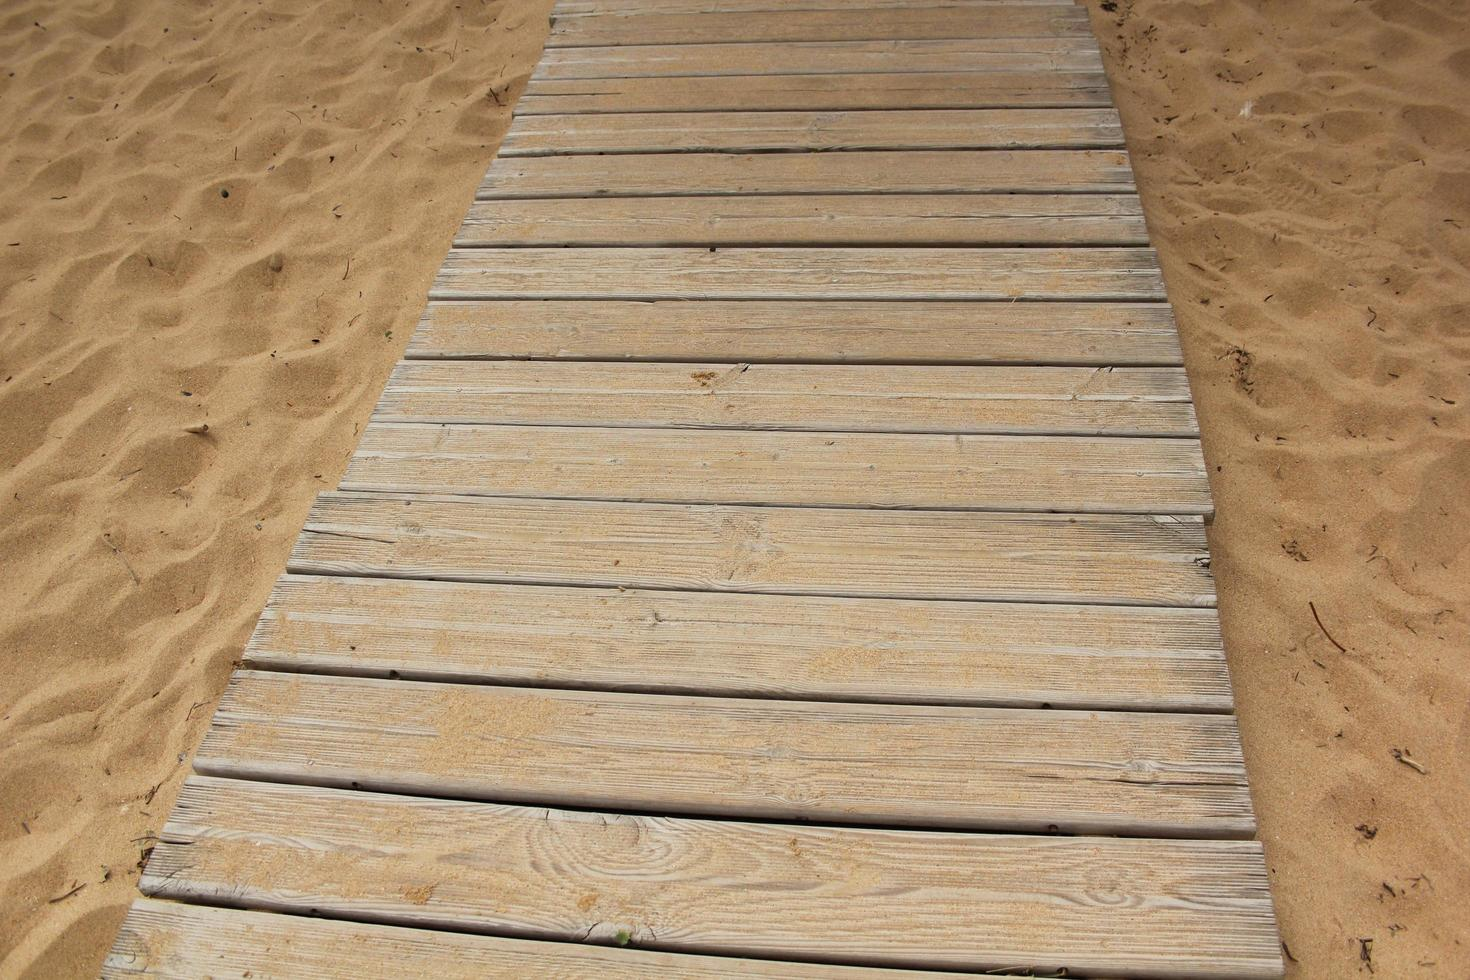 Beach boardwalk path photo